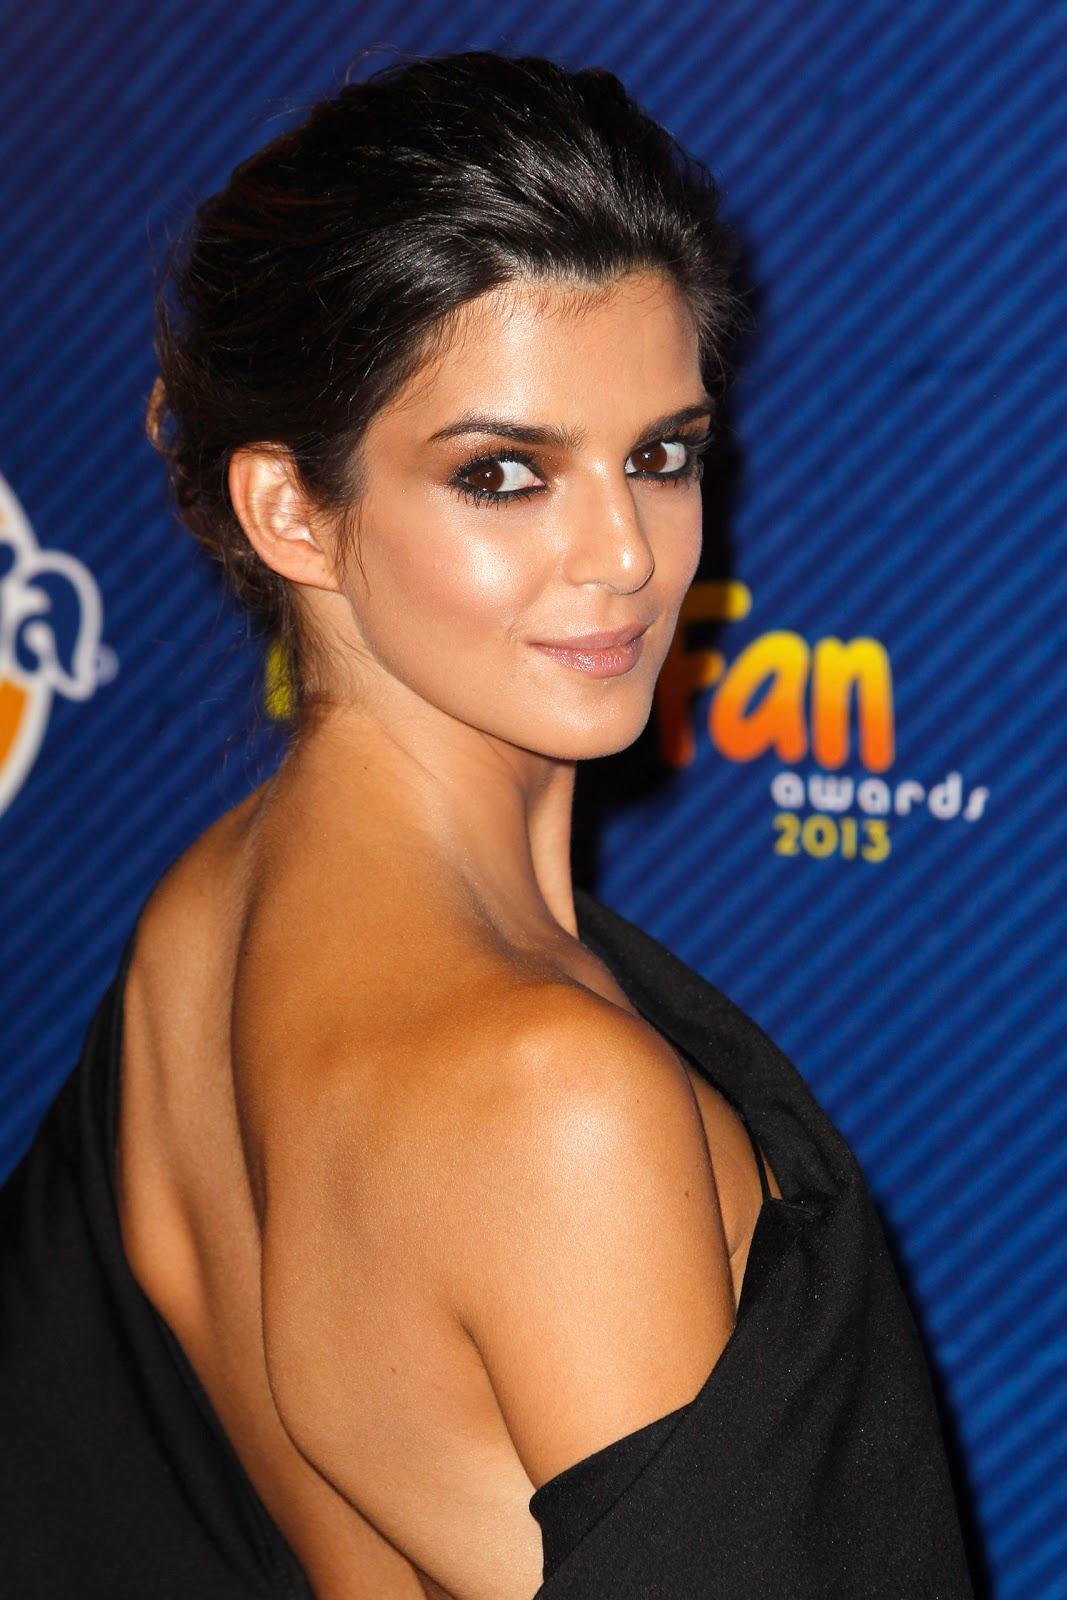 Celebrity Photos - Spanish Actress Clara Lago Grau HD Photos & Wallpapers